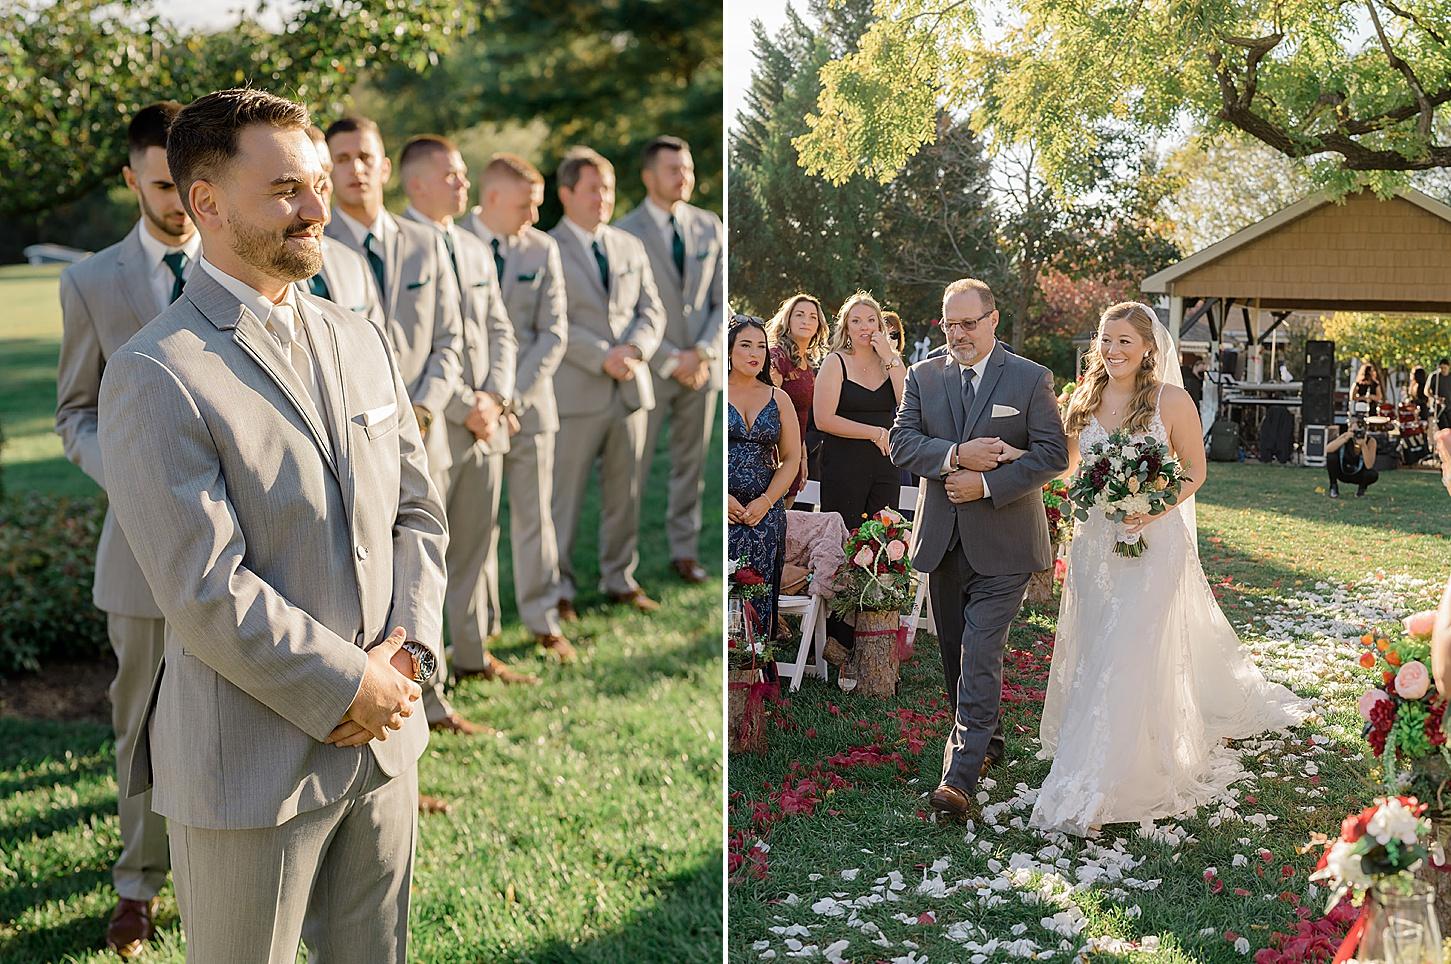 Valenzano Winery Vitners Pavillion Wedding Photography by Magdalena Studios 0020